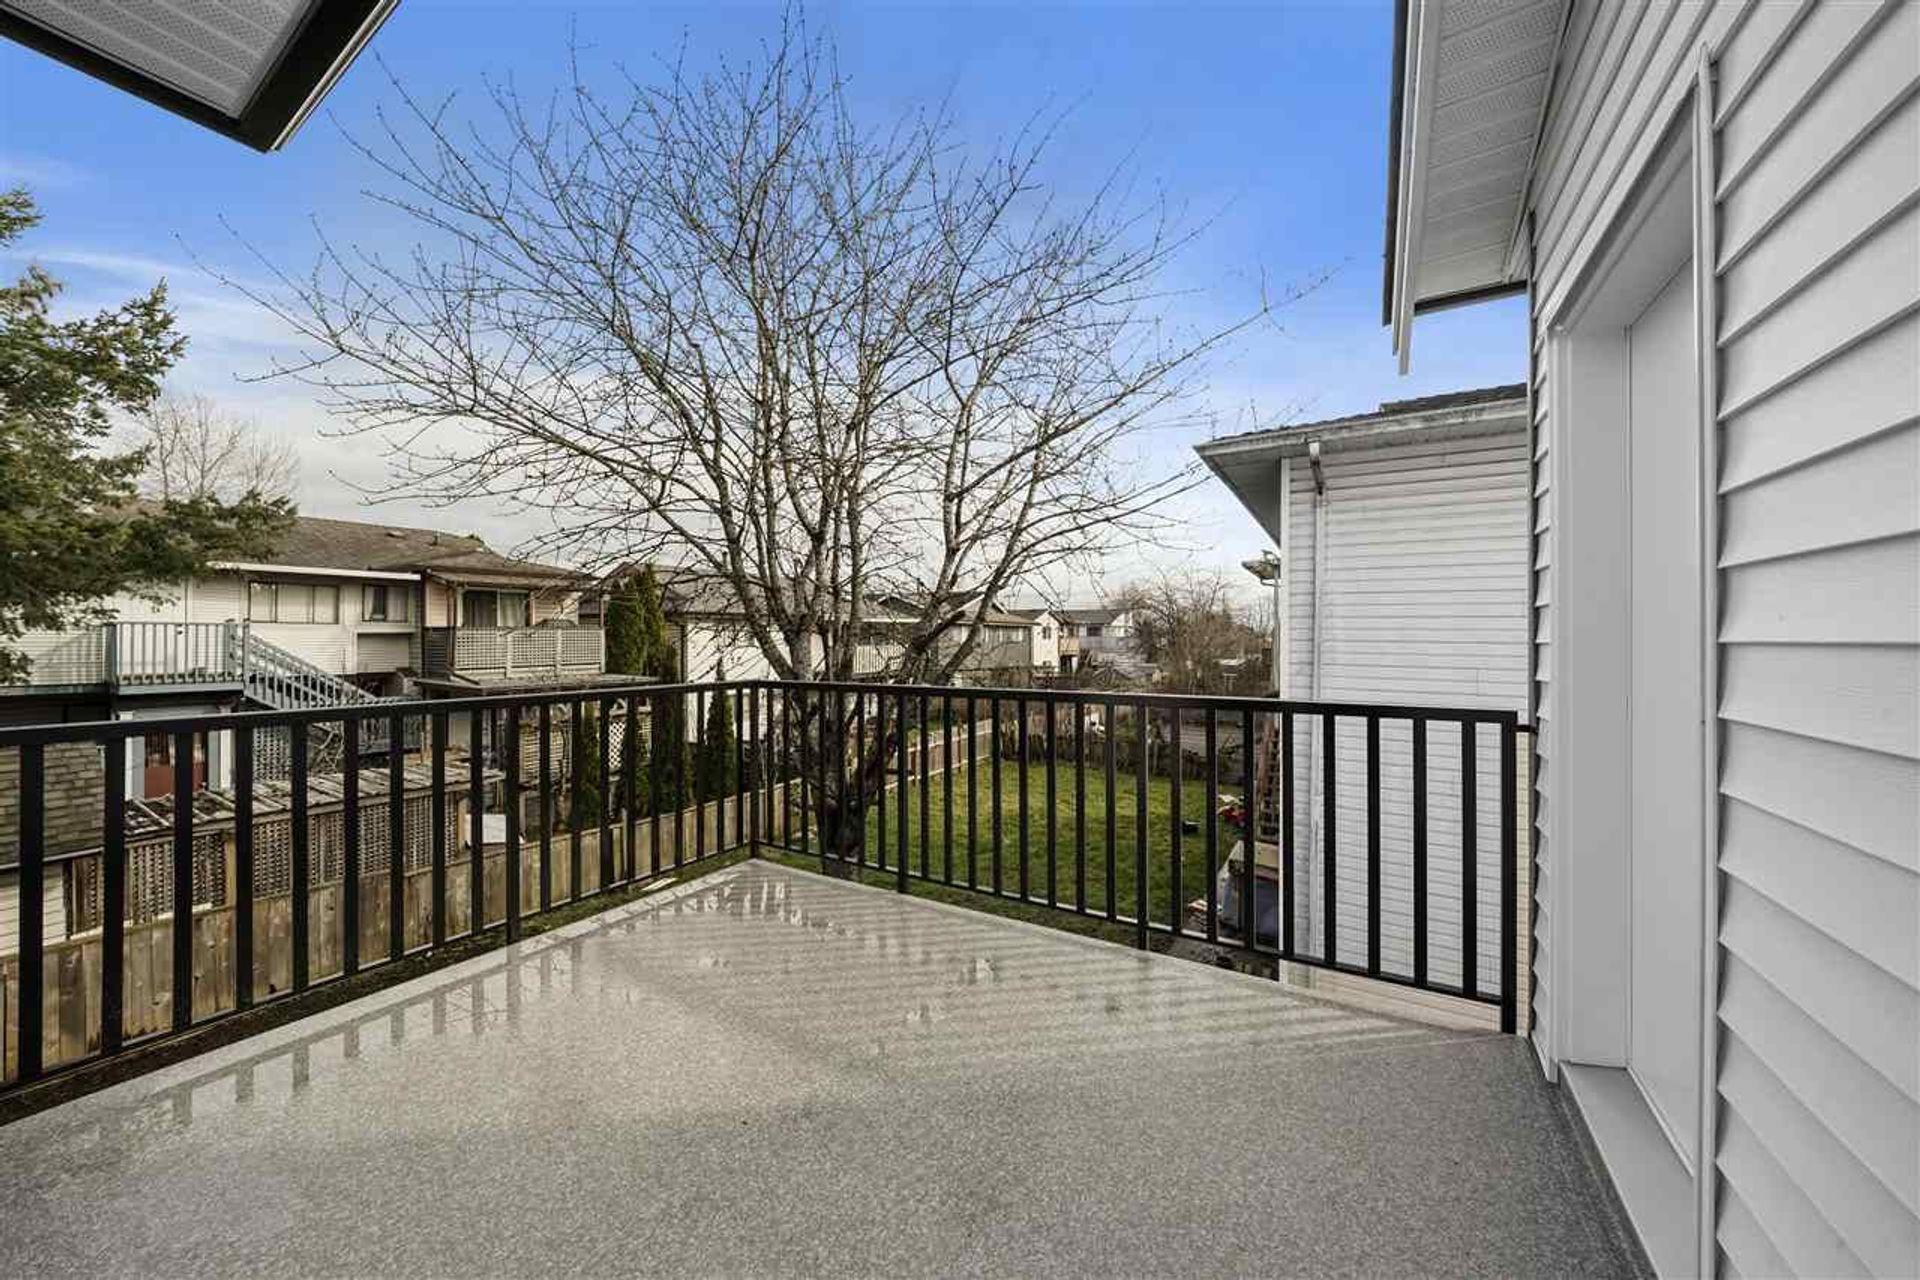 12857-115a-avenue-bridgeview-north-surrey-09 at 12857 115a Avenue, Bridgeview, North Surrey